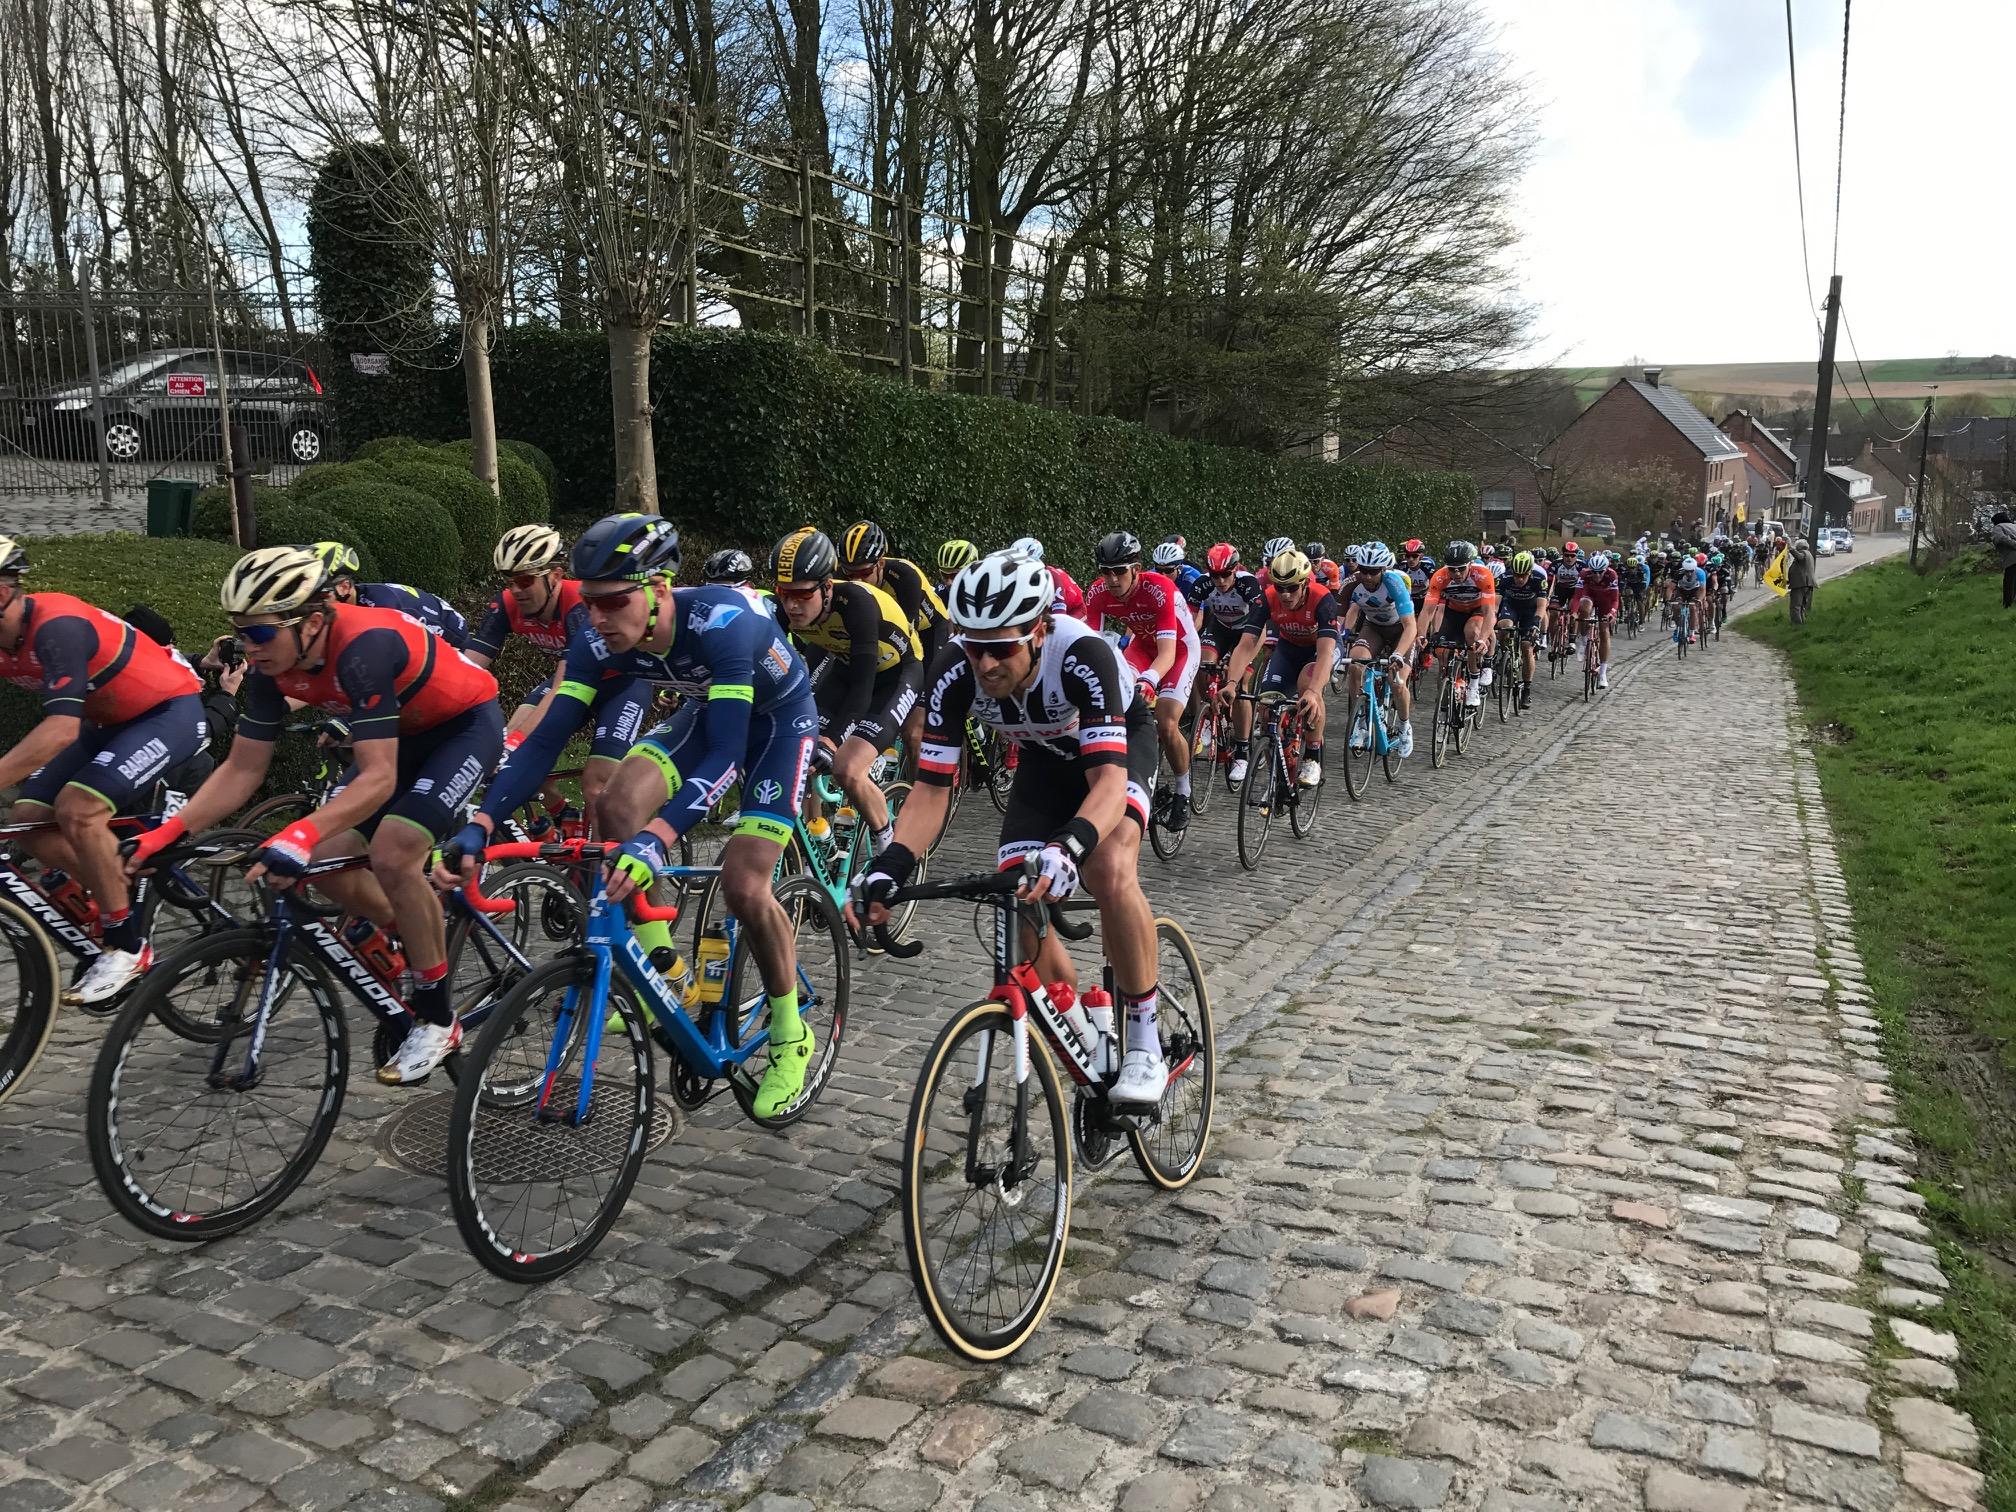 Dwars Vlaanderen 17 - The peloton hits the Eikenberg cobbles near Maarke Kerkem